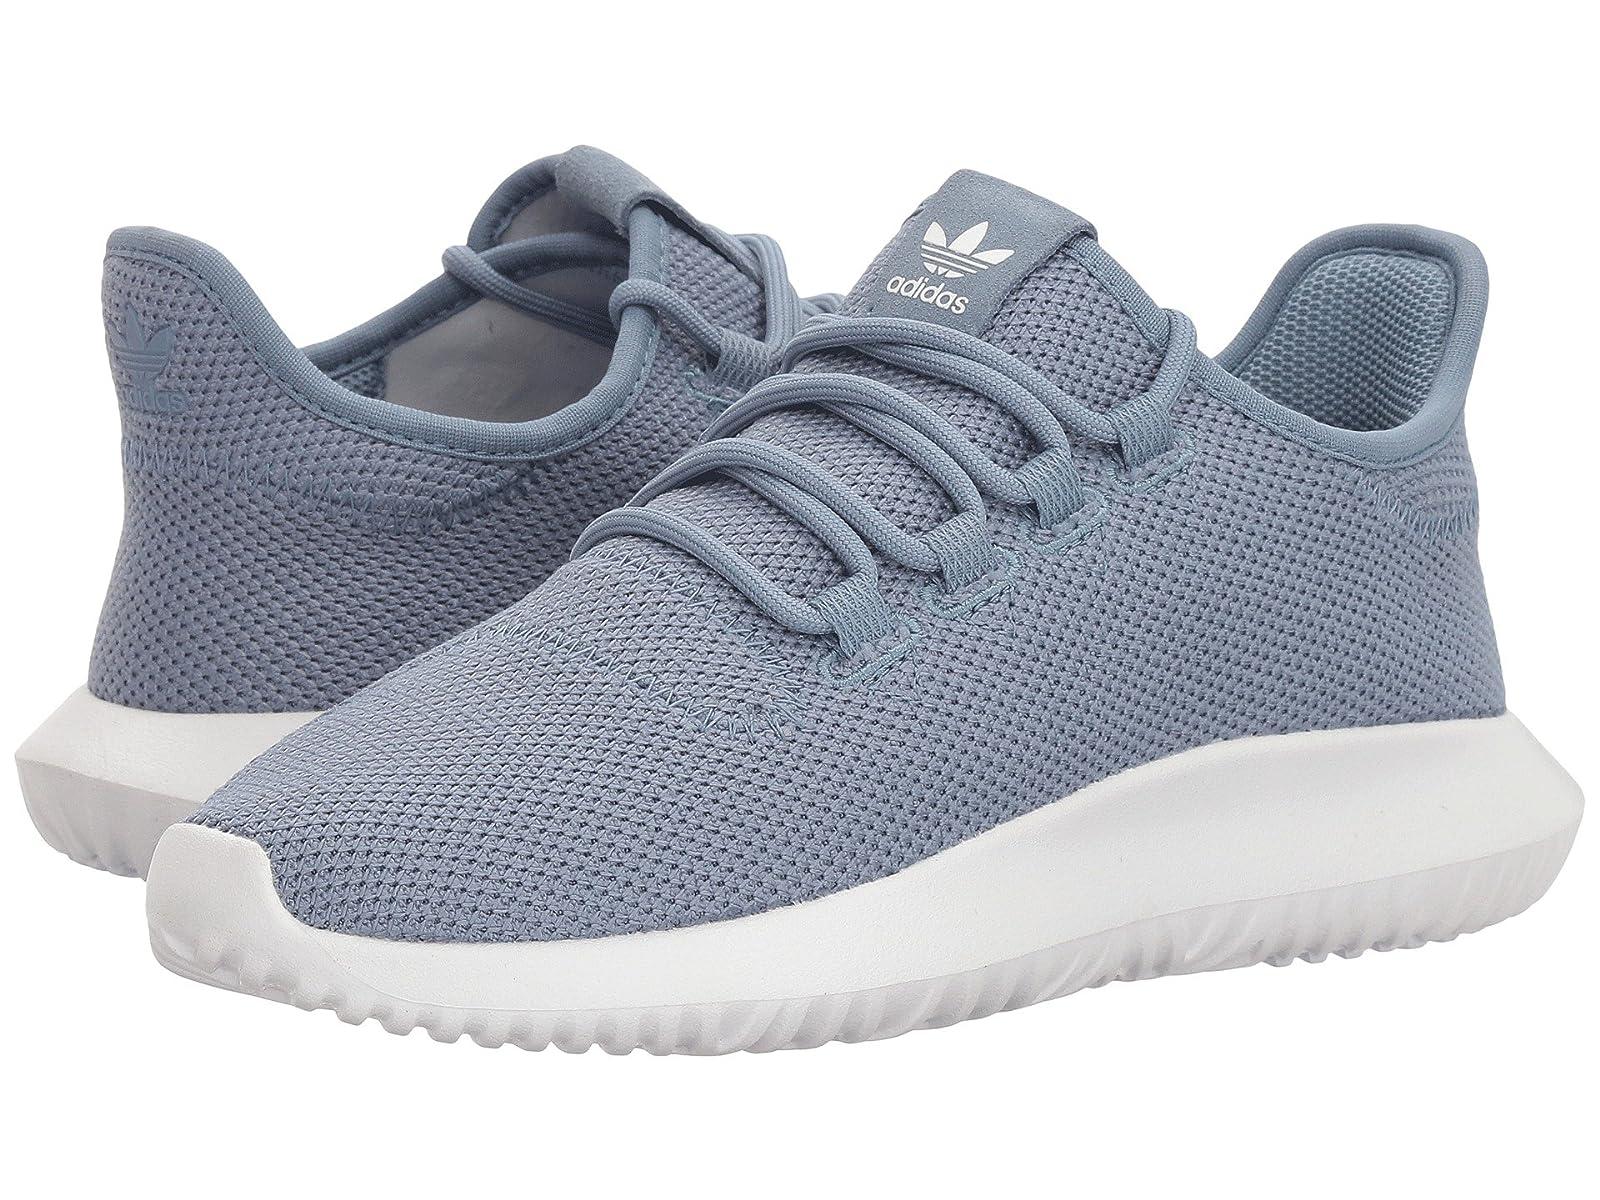 adidas Originals Kids Tubular Shadow J (Big Kid)Atmospheric grades have affordable shoes